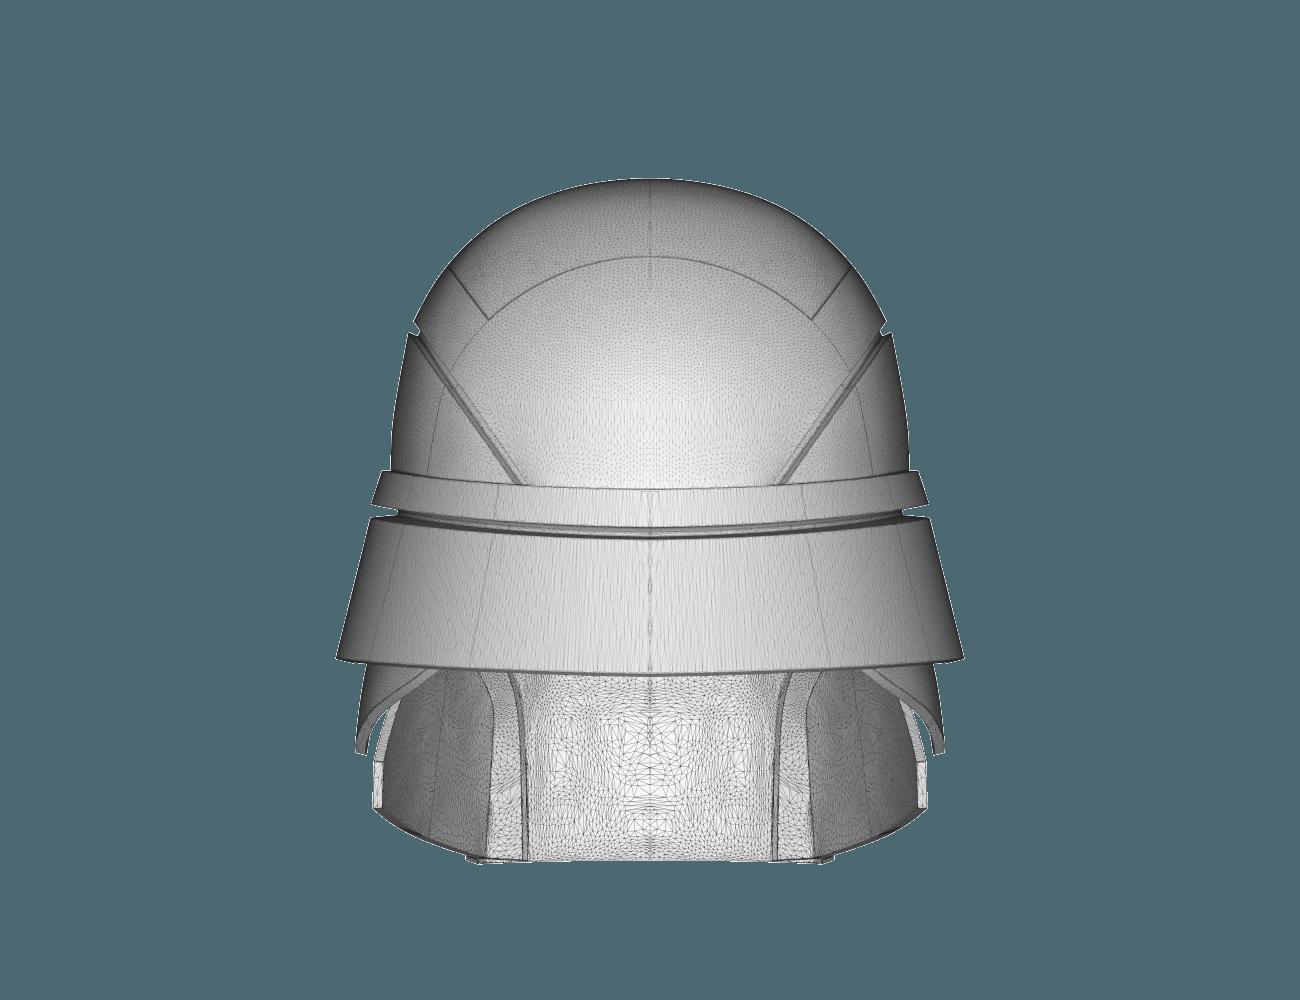 render_scene-back.10.png Download STL file Armory - Knights of Ren Helmet, StarWars model for 3D Print • 3D printing design, 3D-mon